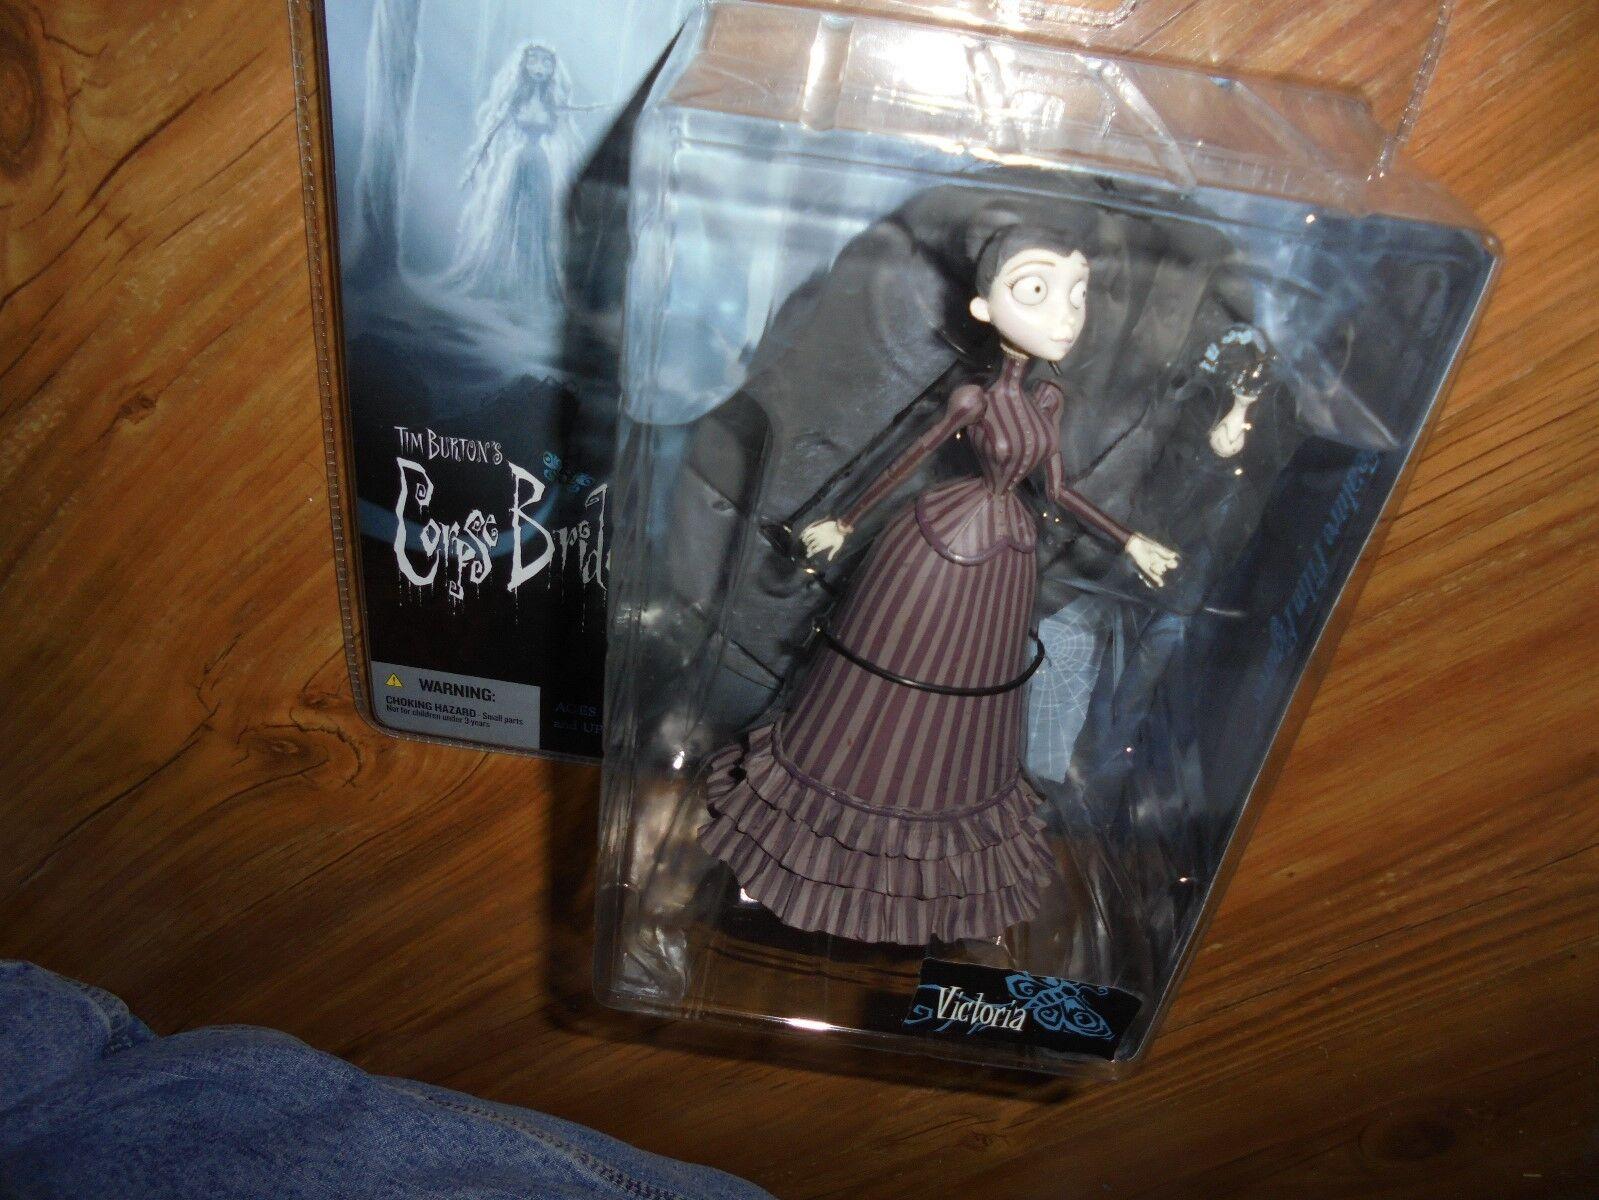 Tim Burtons  Corpse Bride  Series 1  VICTORIA  Action Figure  McFarlane 2005